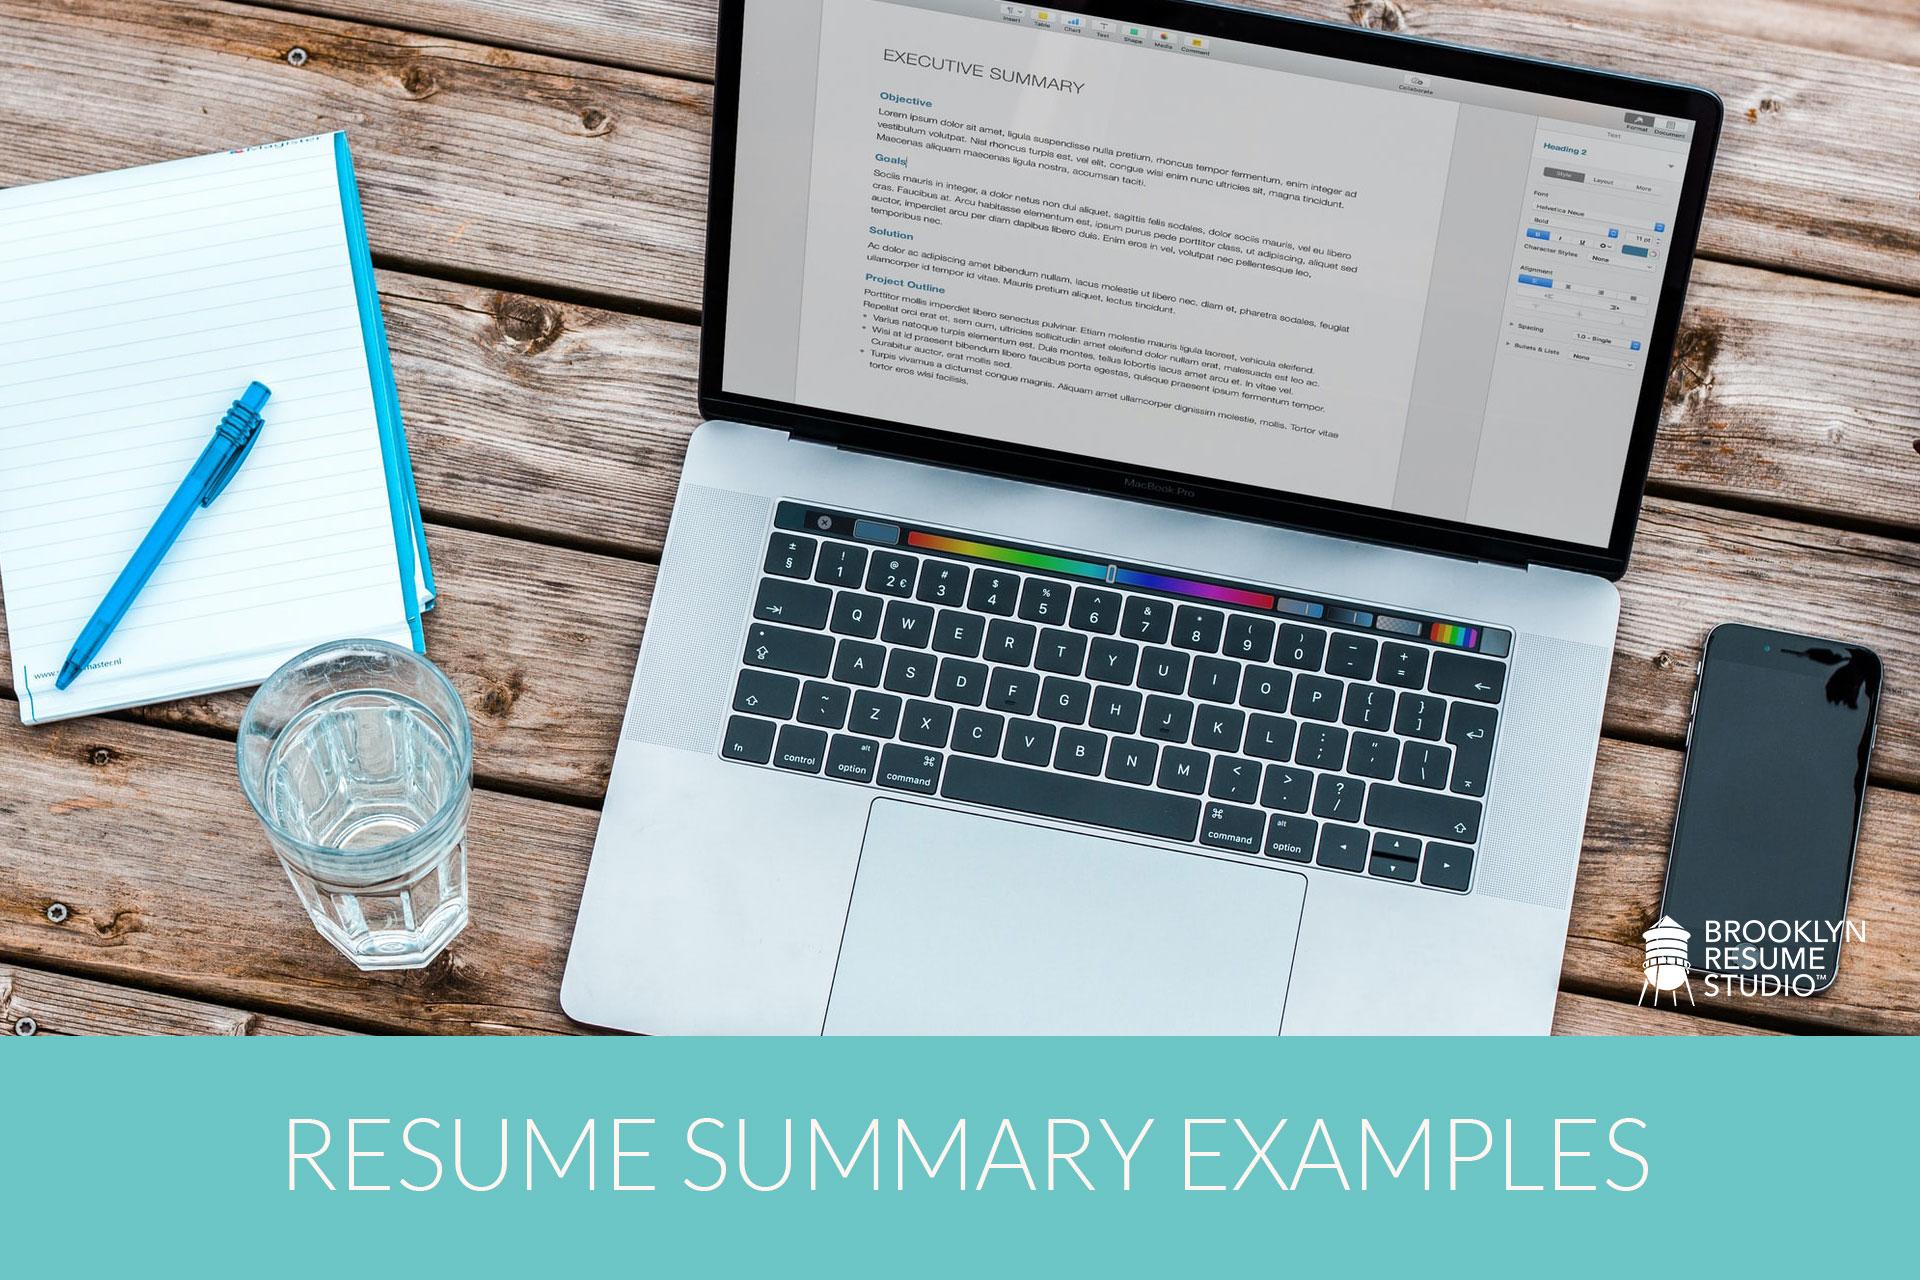 How To Write A Resume Summary Statement Brooklyn Resume Studio